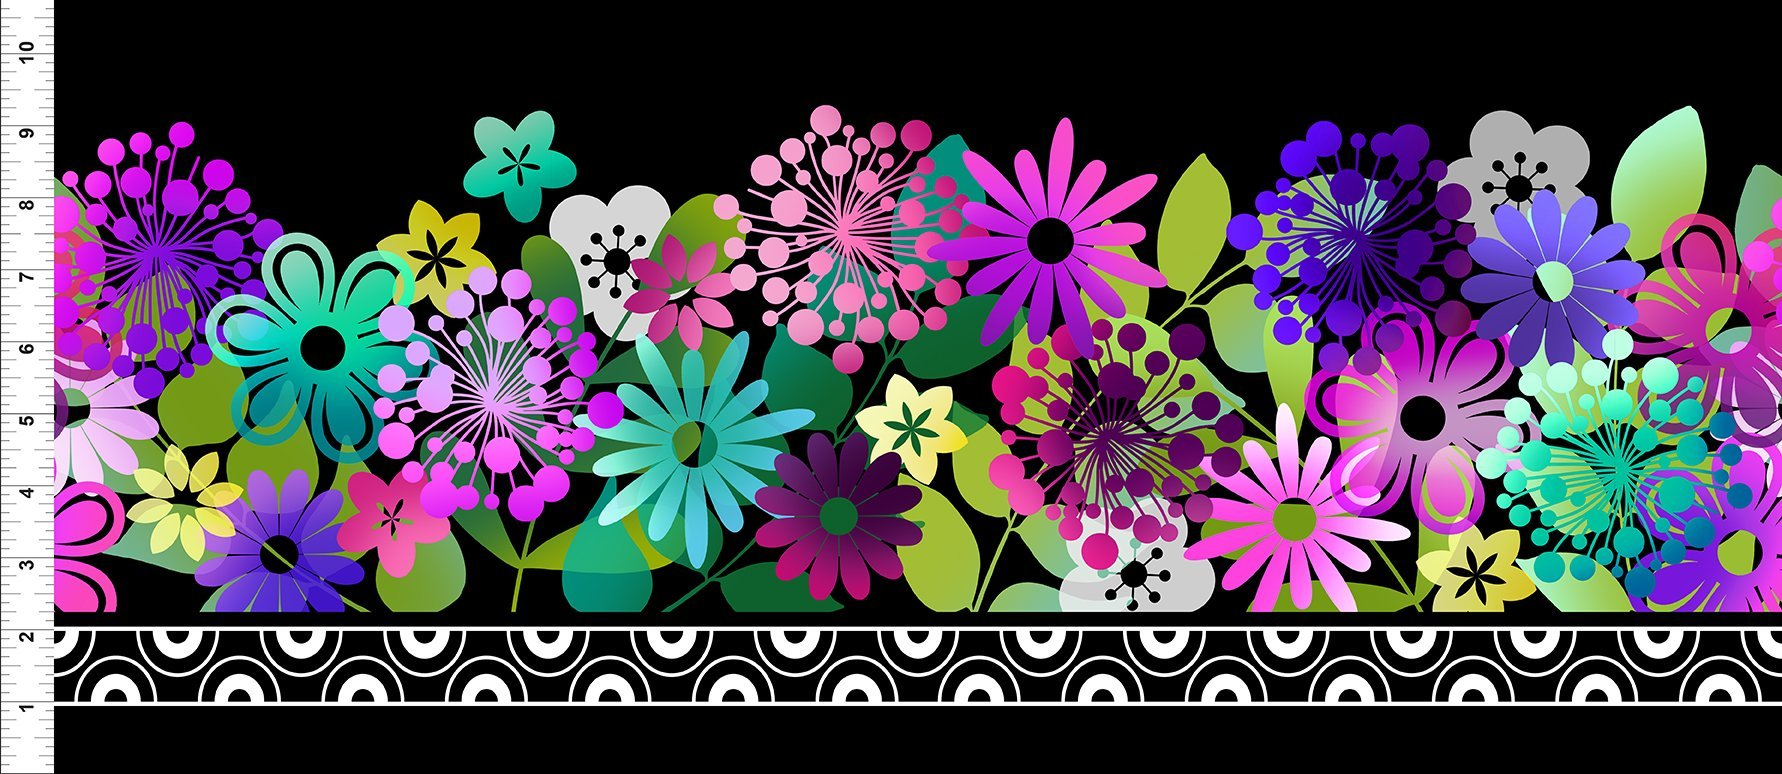 A Groovy Garden - Border Purple